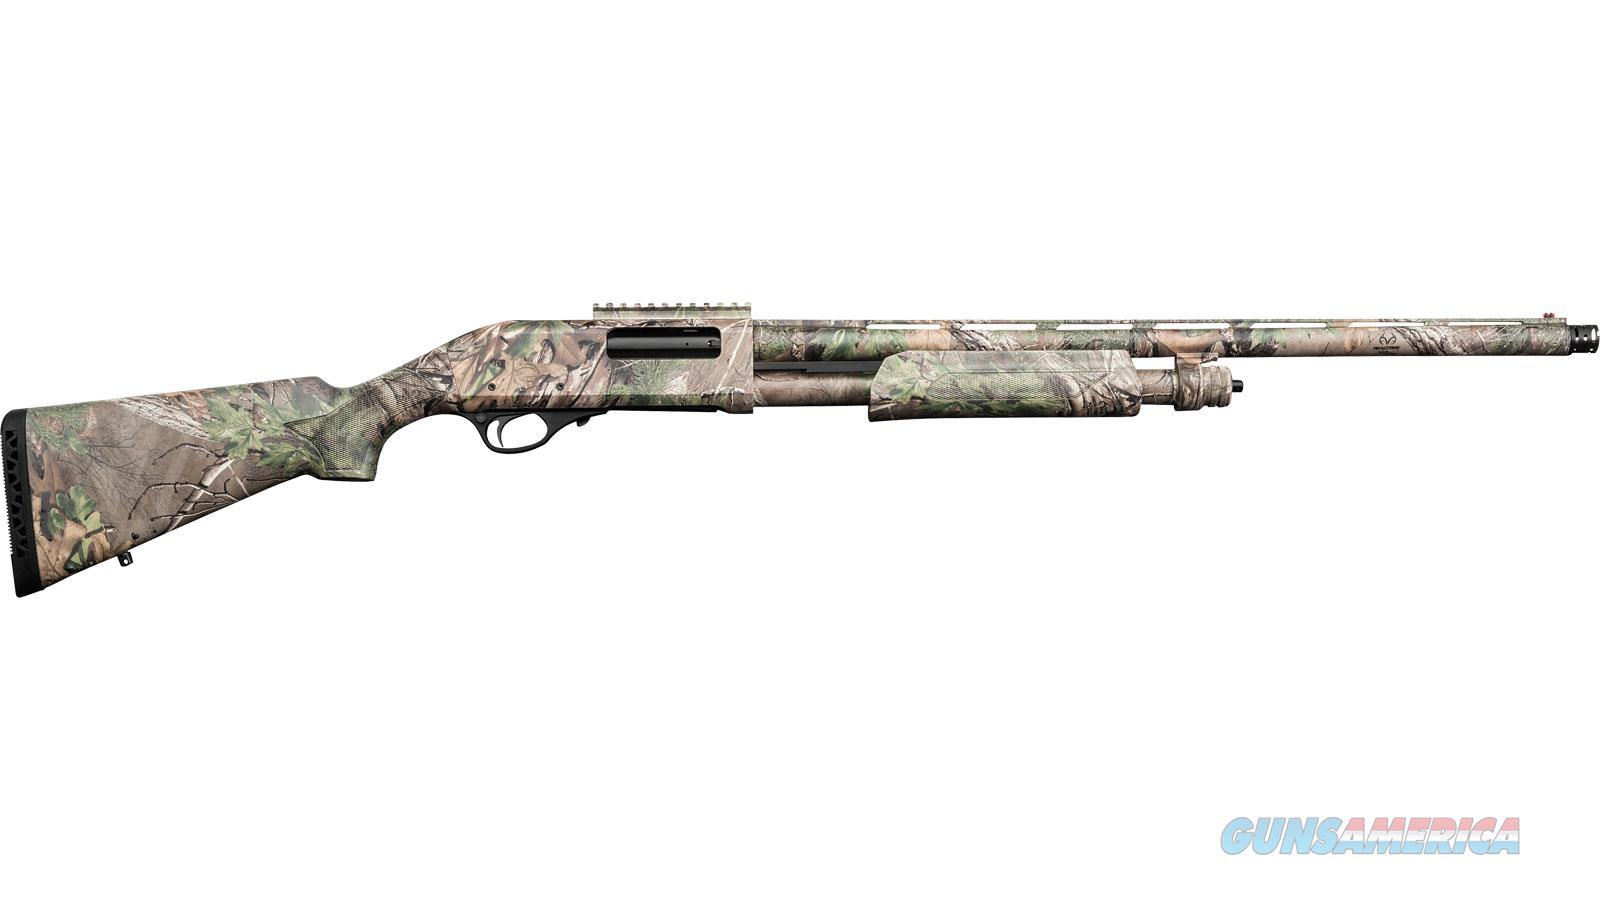 "Chiappa Firearmsmks C6 12G 24"" 5Rd 930.066  Guns > Shotguns > C Misc Shotguns"